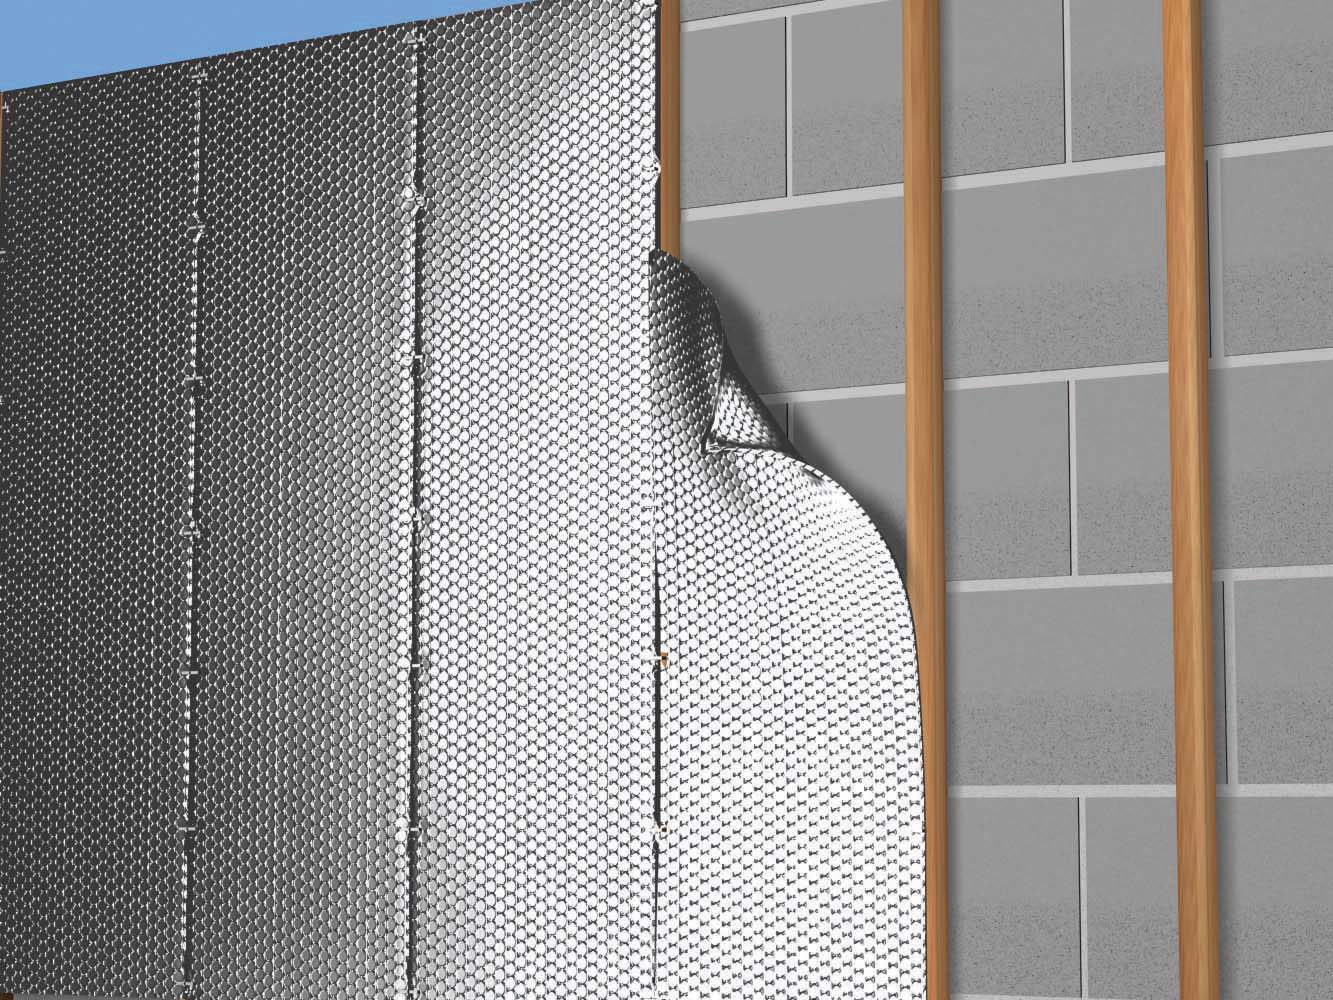 Folie termoizolanta utlilizare - Hale industriale REFLECTIX - Poza 1